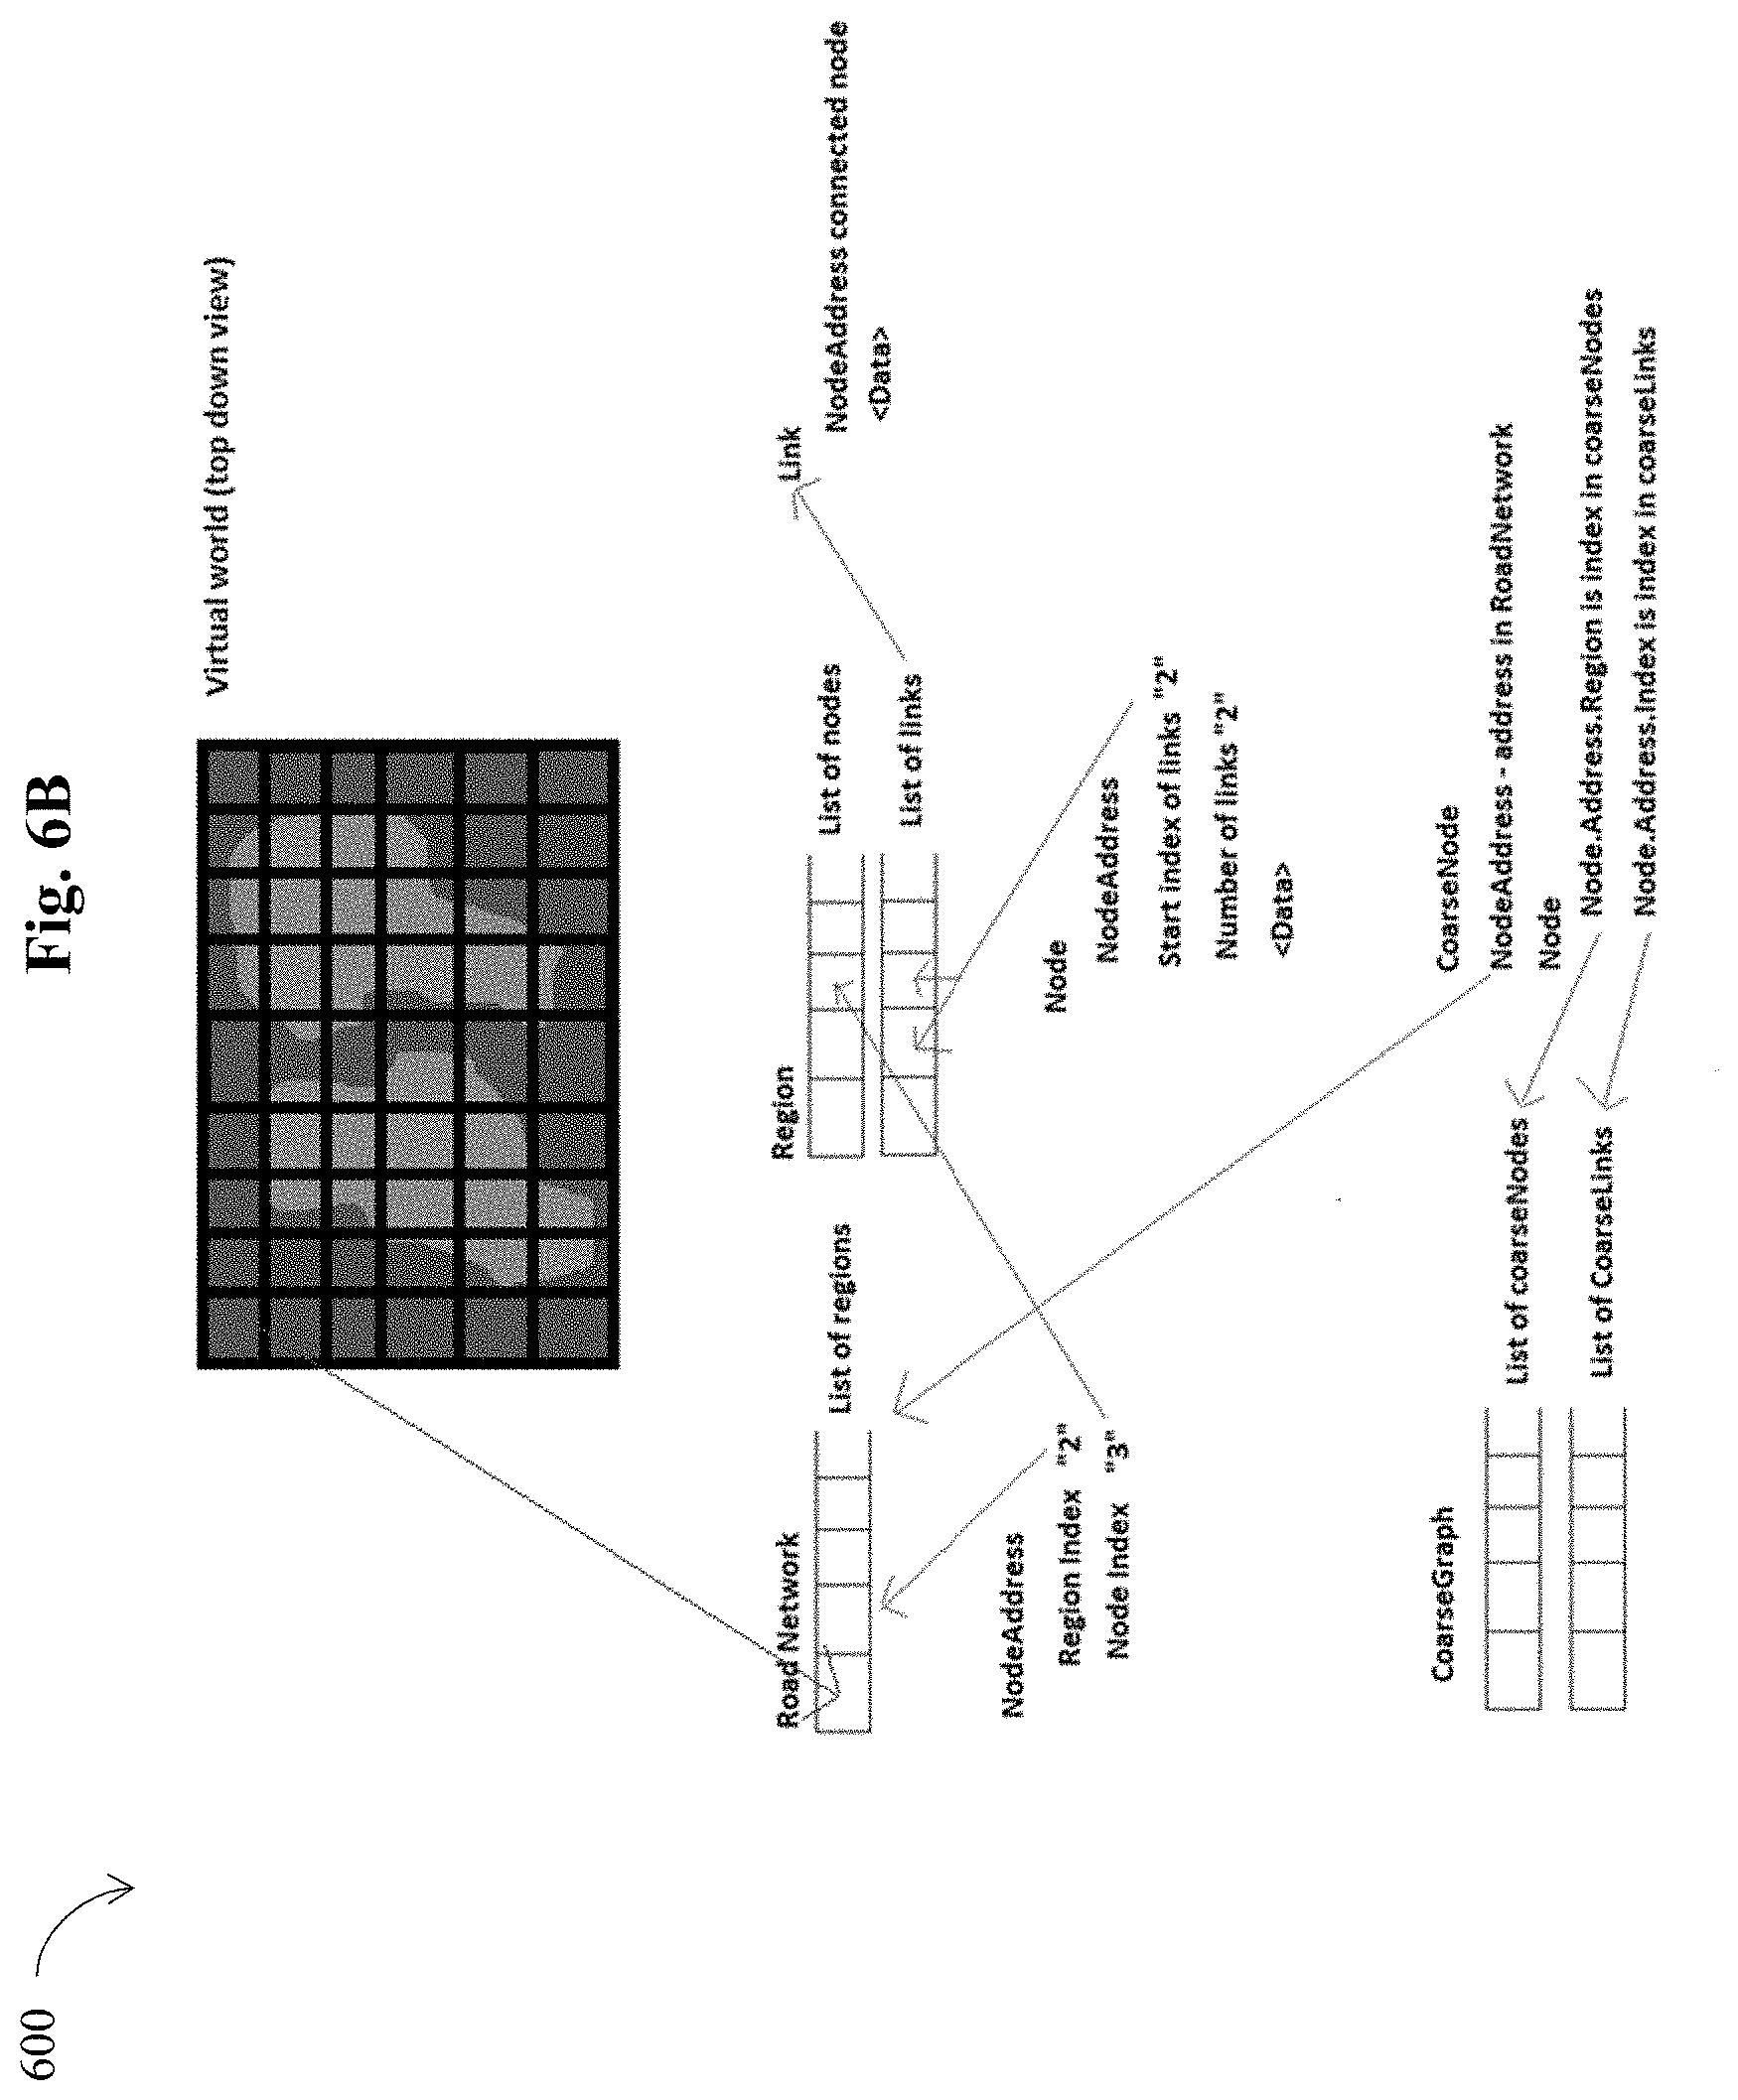 US20200338450A1-20201029-D00007.png